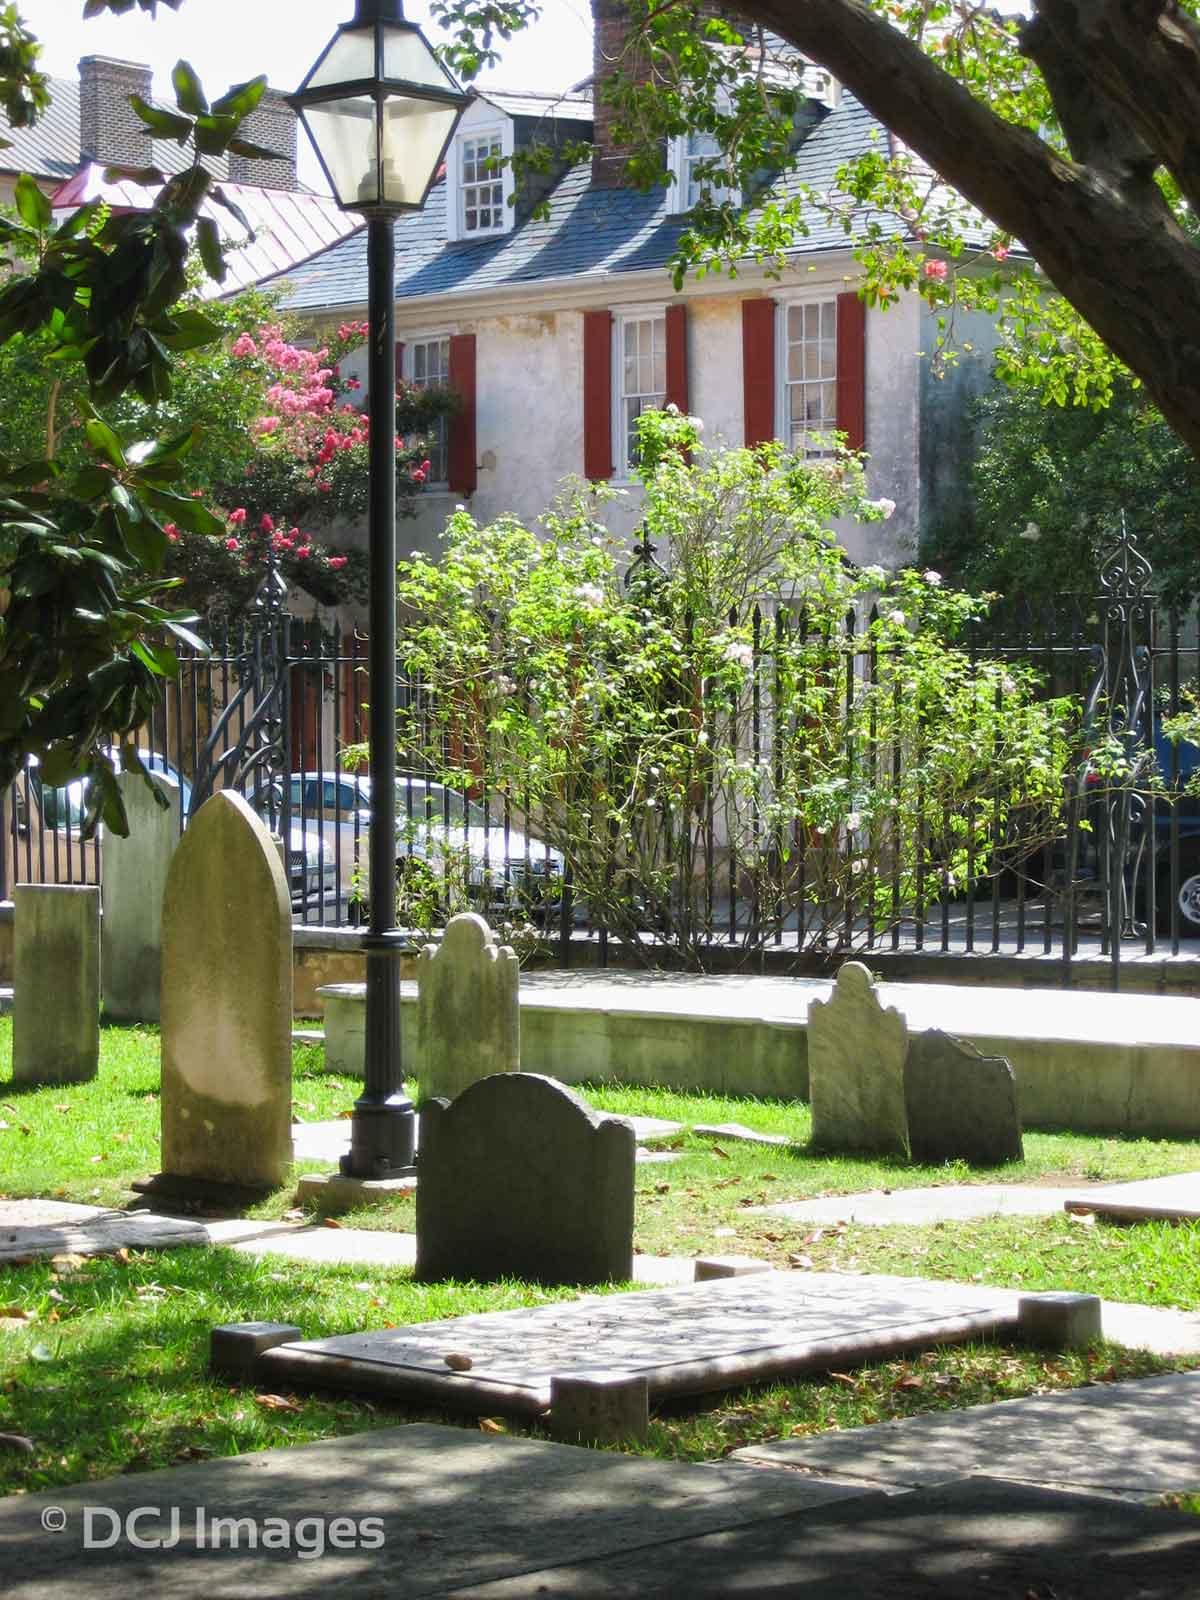 St-Philips-Church-Graveyard